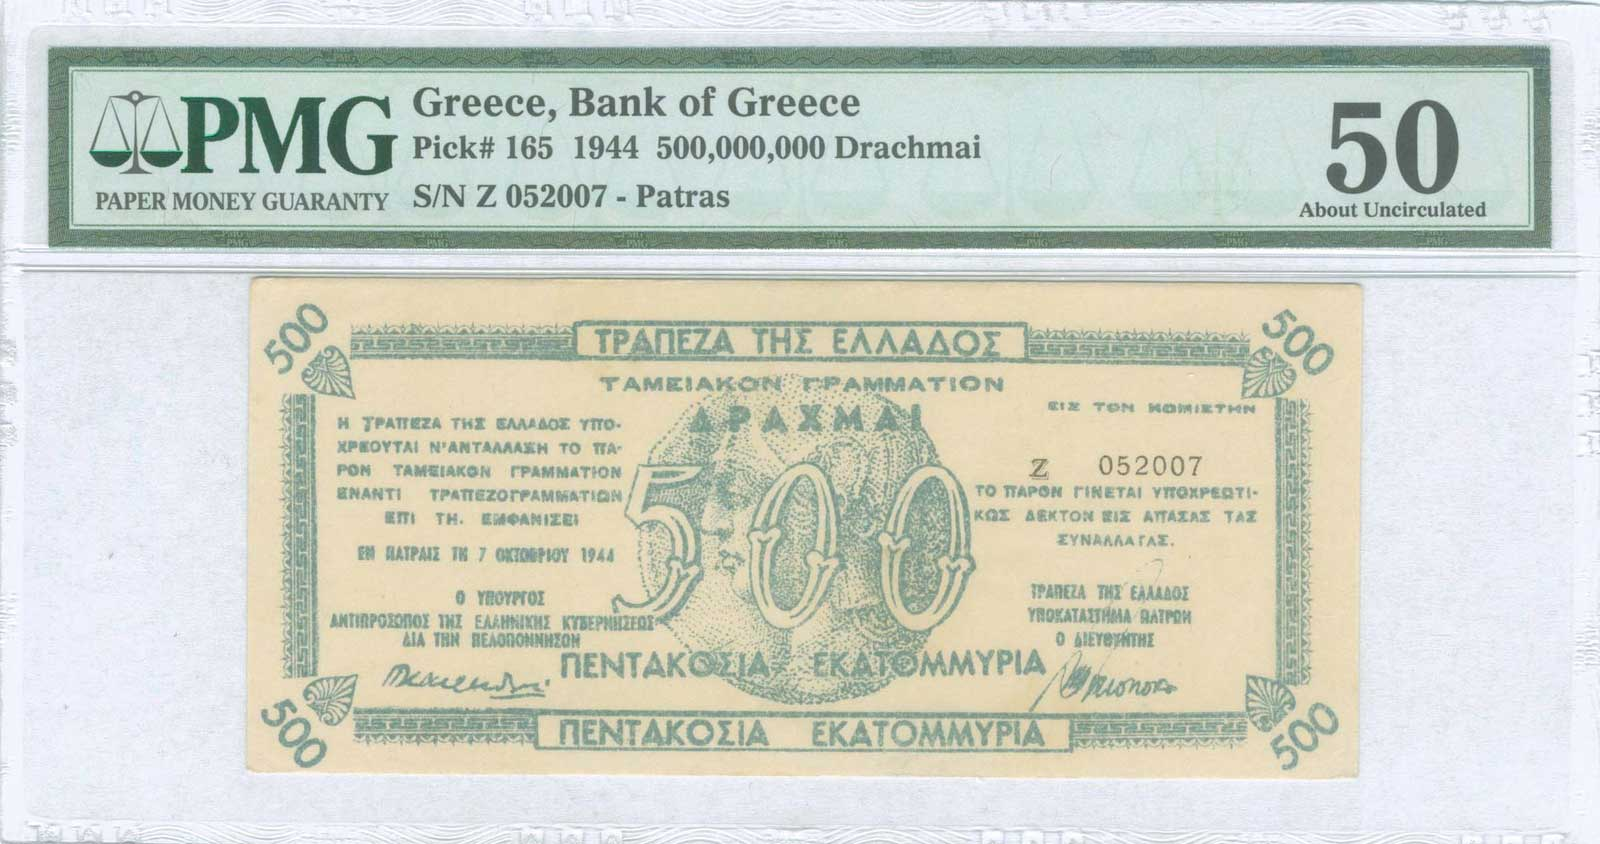 Lot 9397 - GREECE-  PAPER MONEY - BANKNOTES TREASURY BONDS & FISCAL NOTES -  A. Karamitsos Public & LIVE Bid Auction 610 Coins, Medals & Banknotes